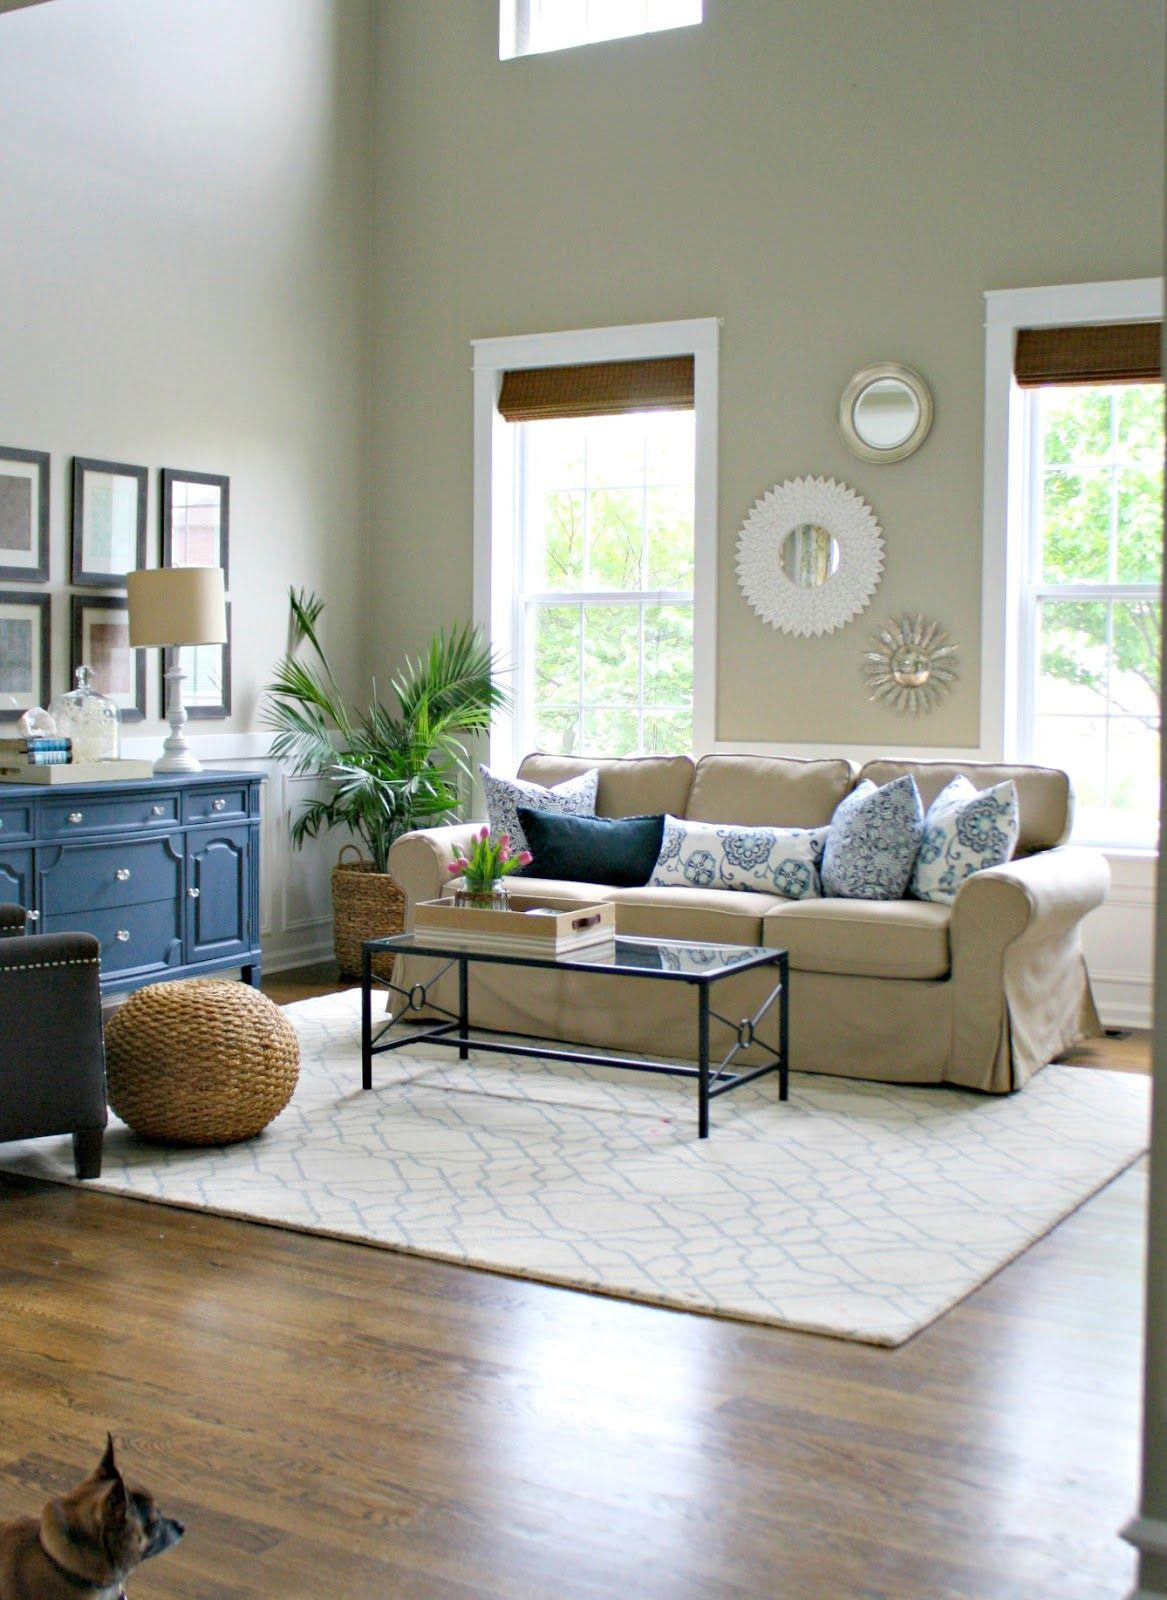 Sherwin williams sunroom colors and decor